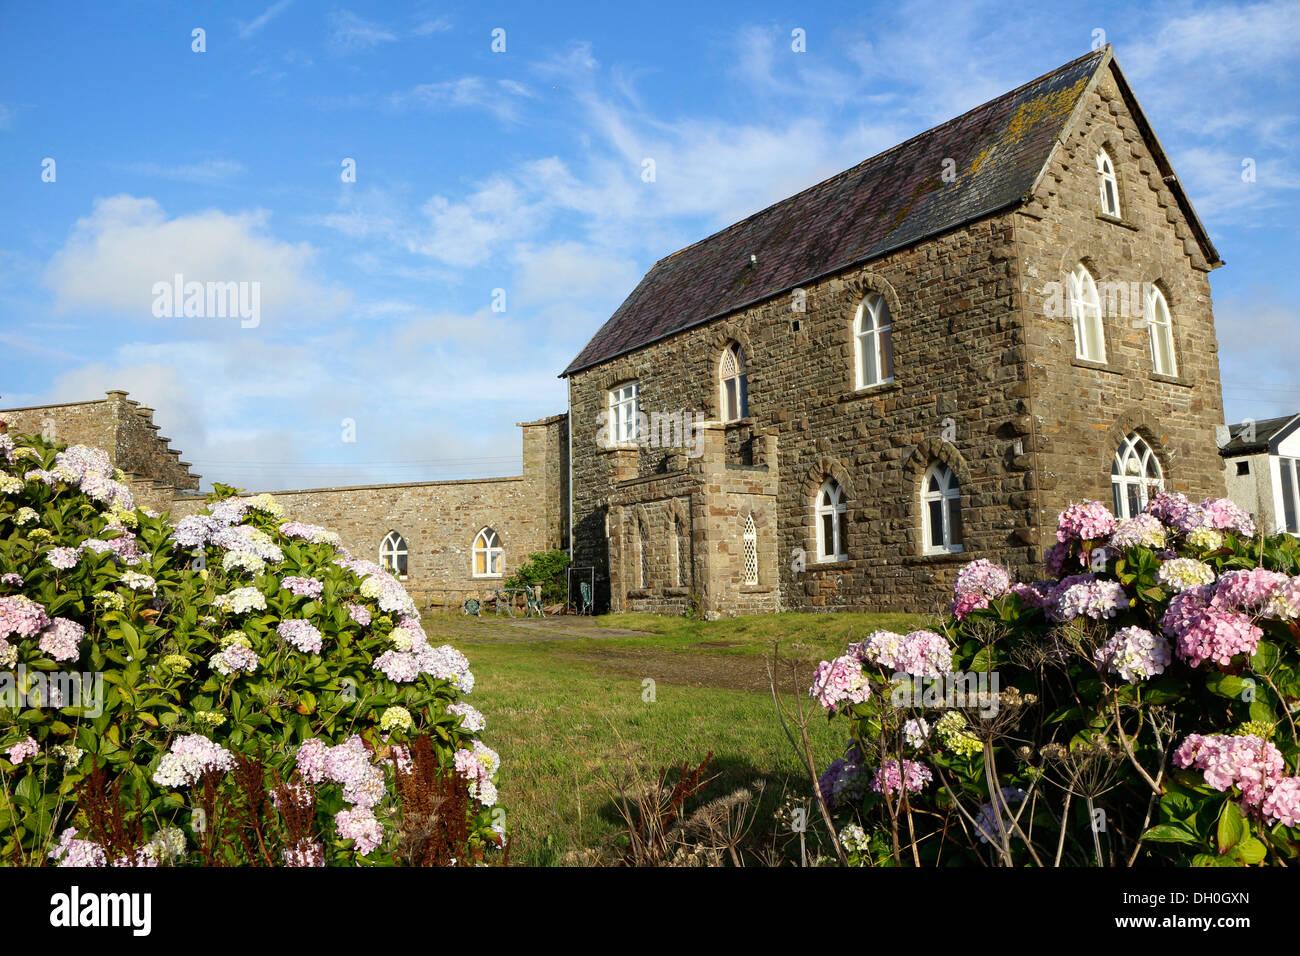 Haven fort hotel, Little Haven Pembrokeshire Wales UK - Stock Image